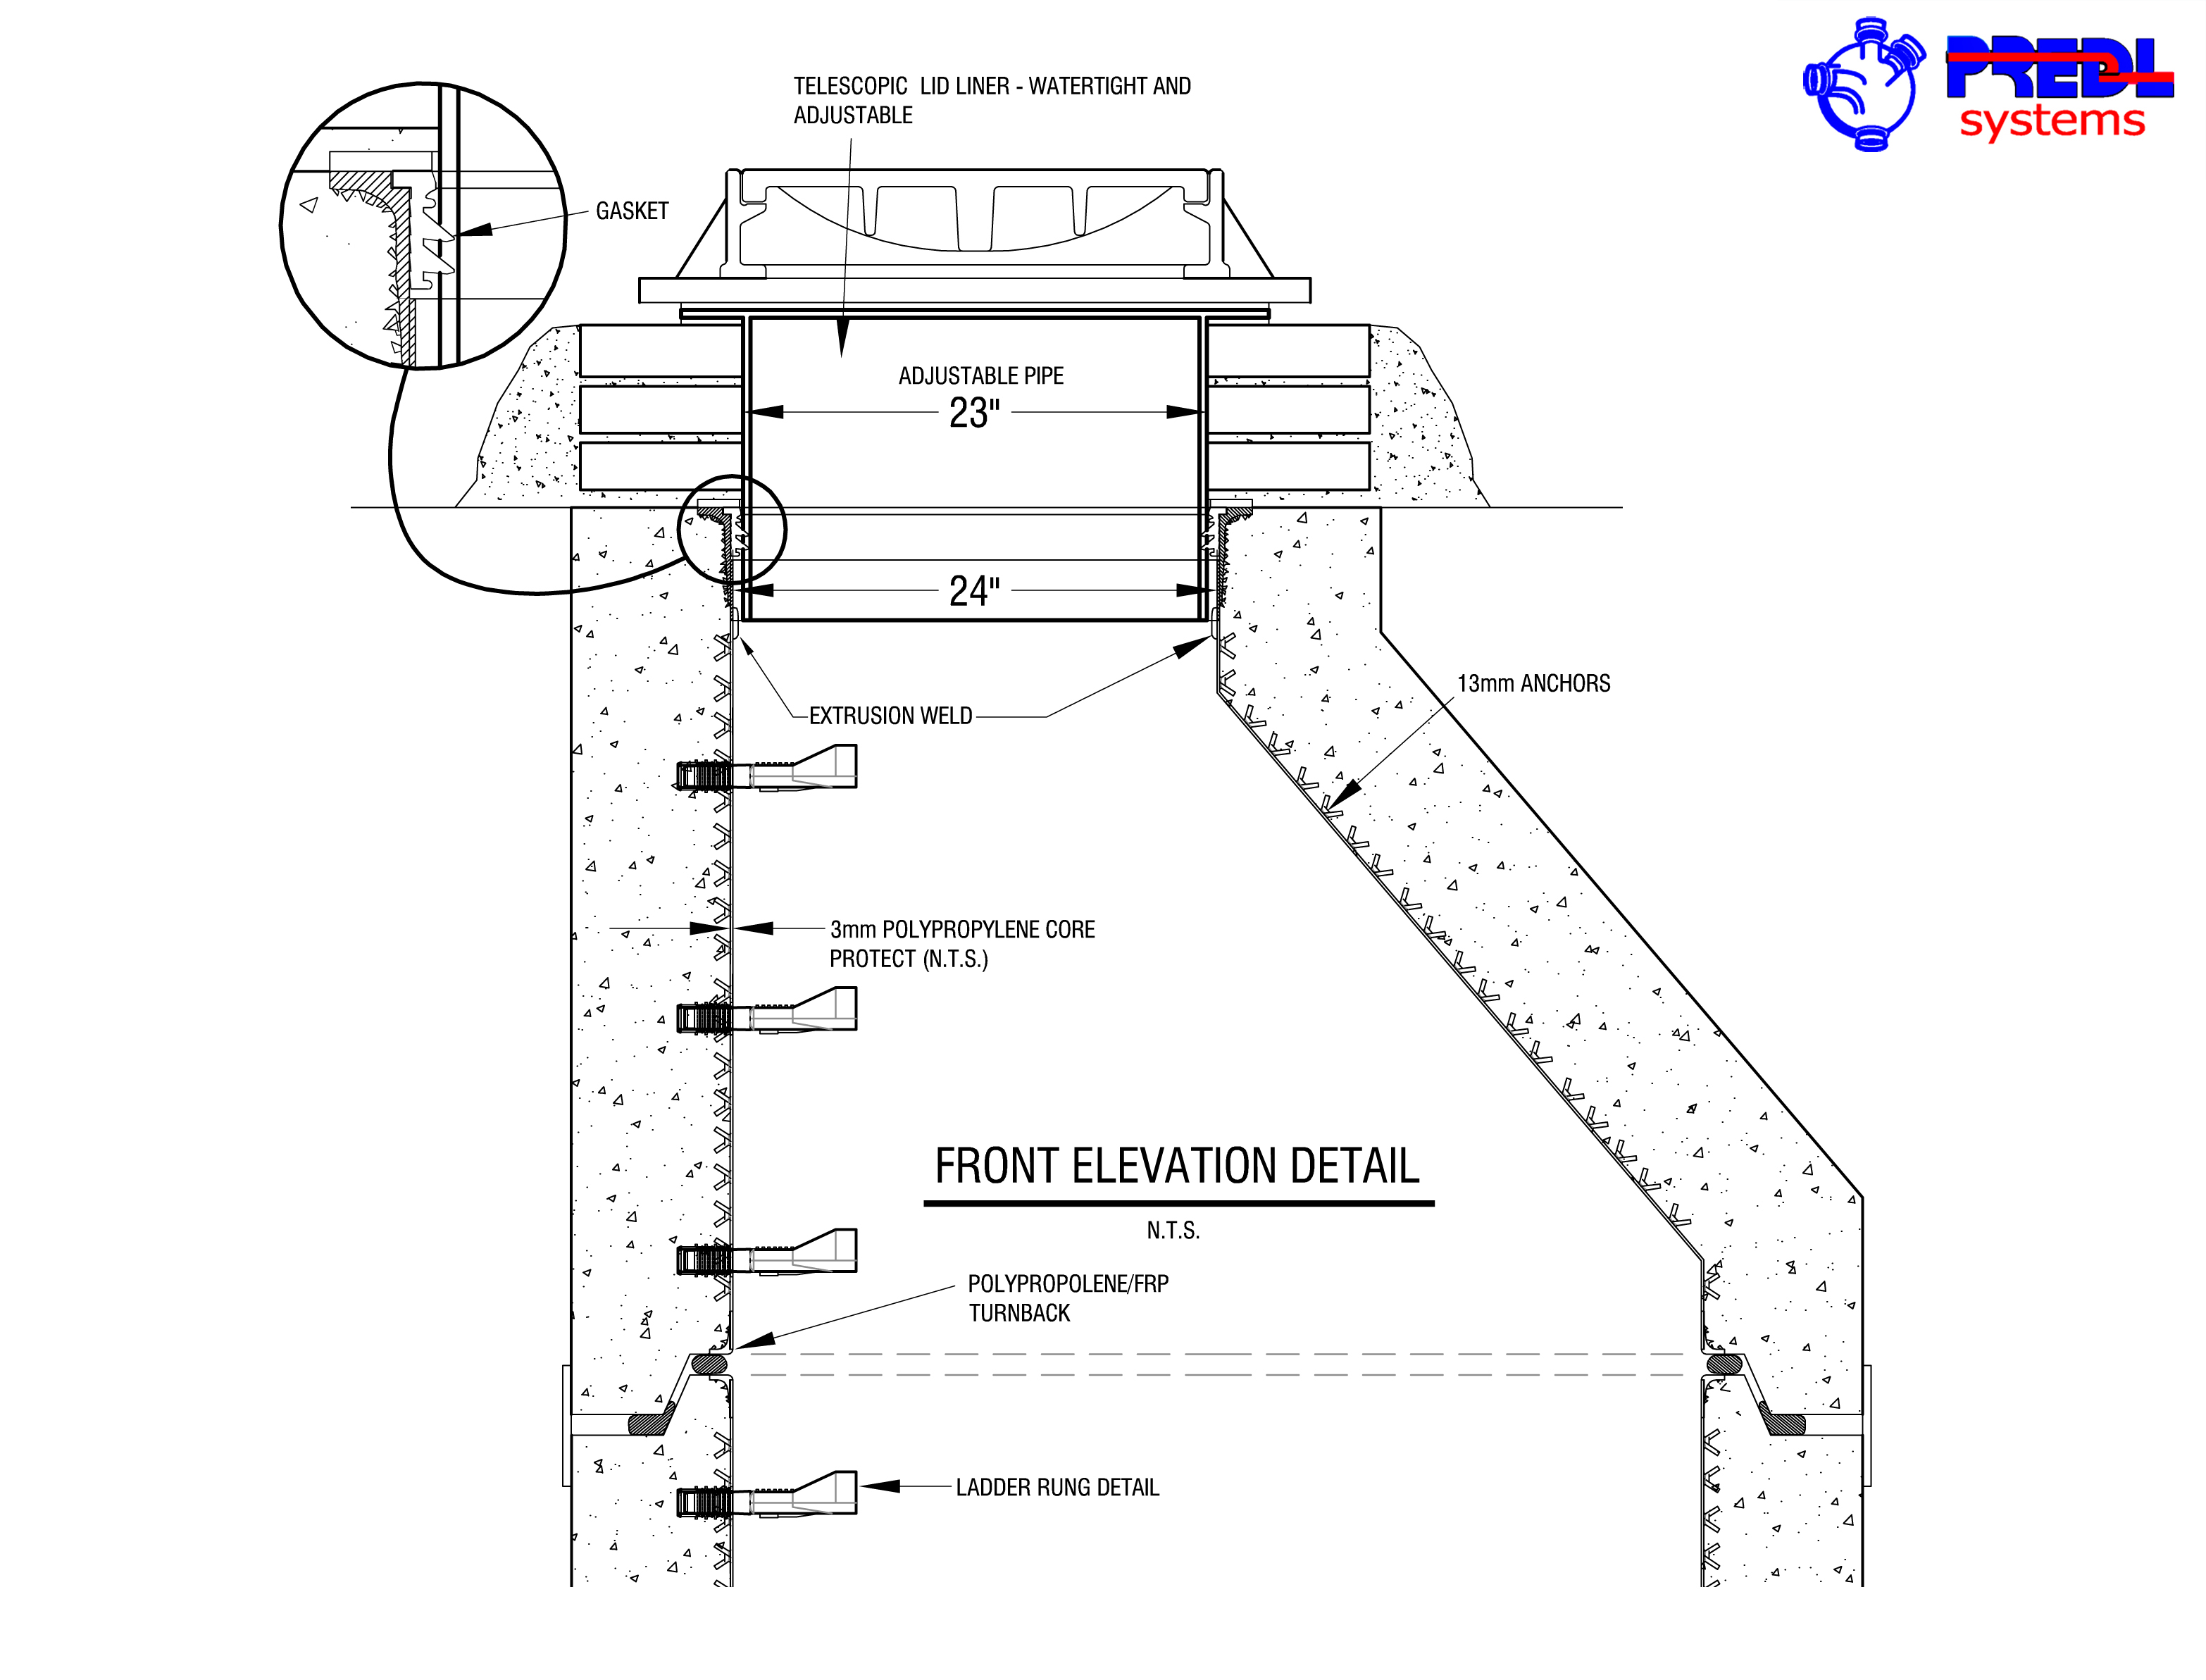 Electrical Precast Concrete Manhole Dimensions : Complete manhole liner systems predl